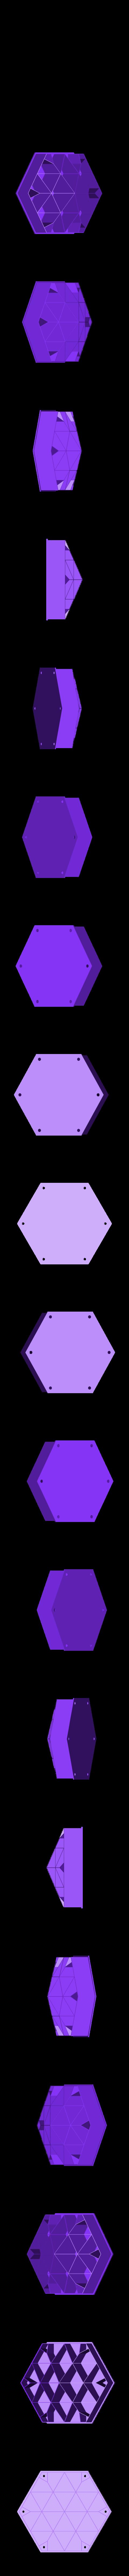 FloatP3_-_Honeychamberrose.stl Download free STL file Honeychamberrose • 3D printable object, Rusichar